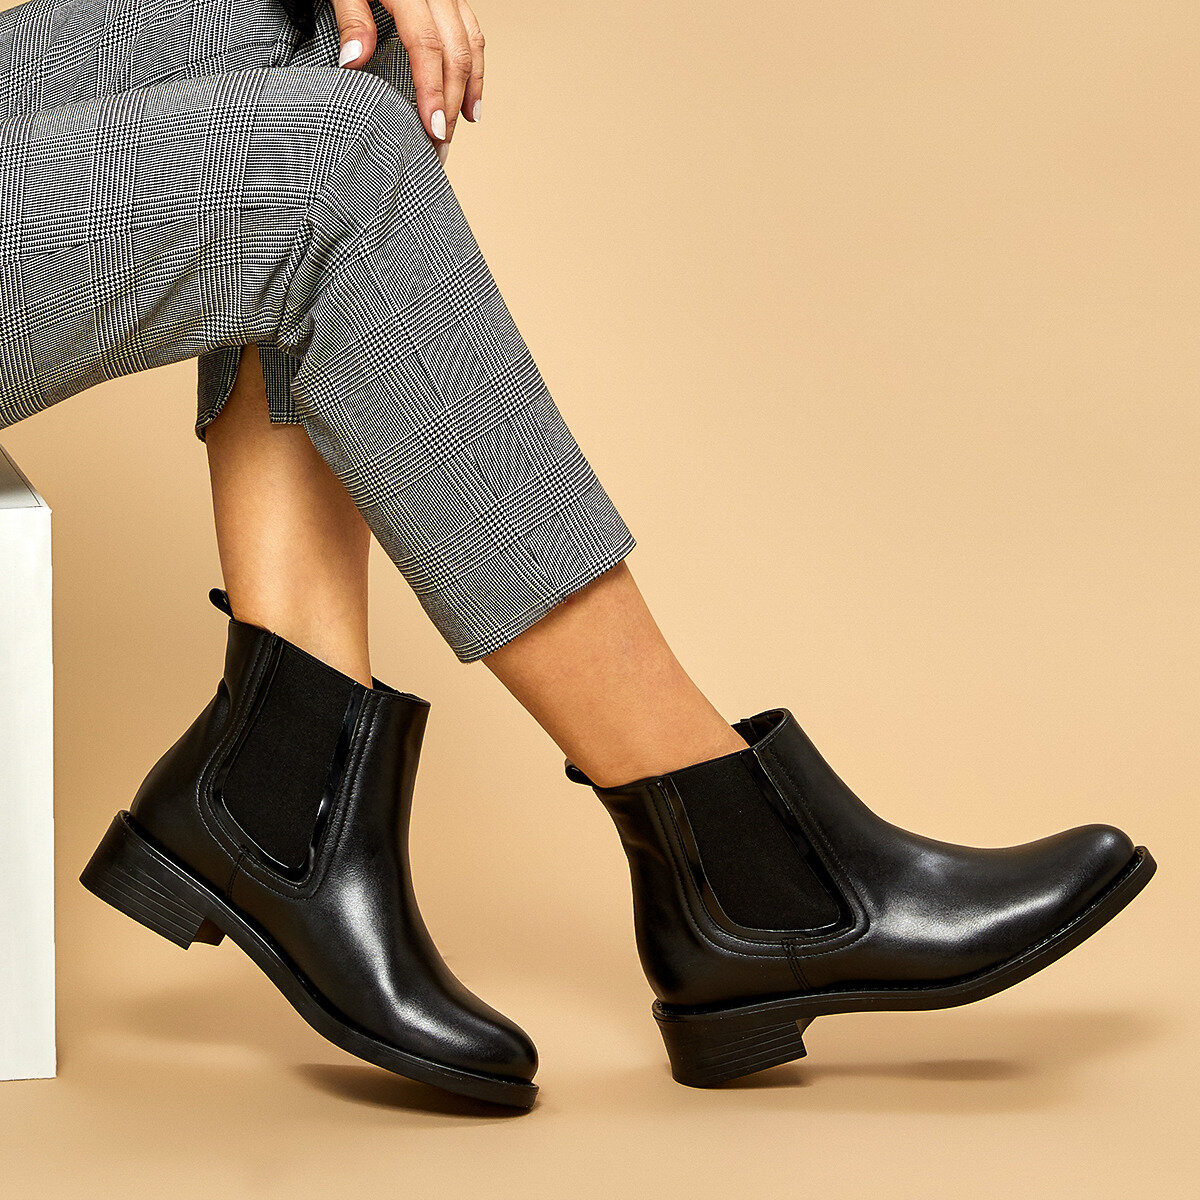 FLO 19K-004 Black Women Boots BUTIGO